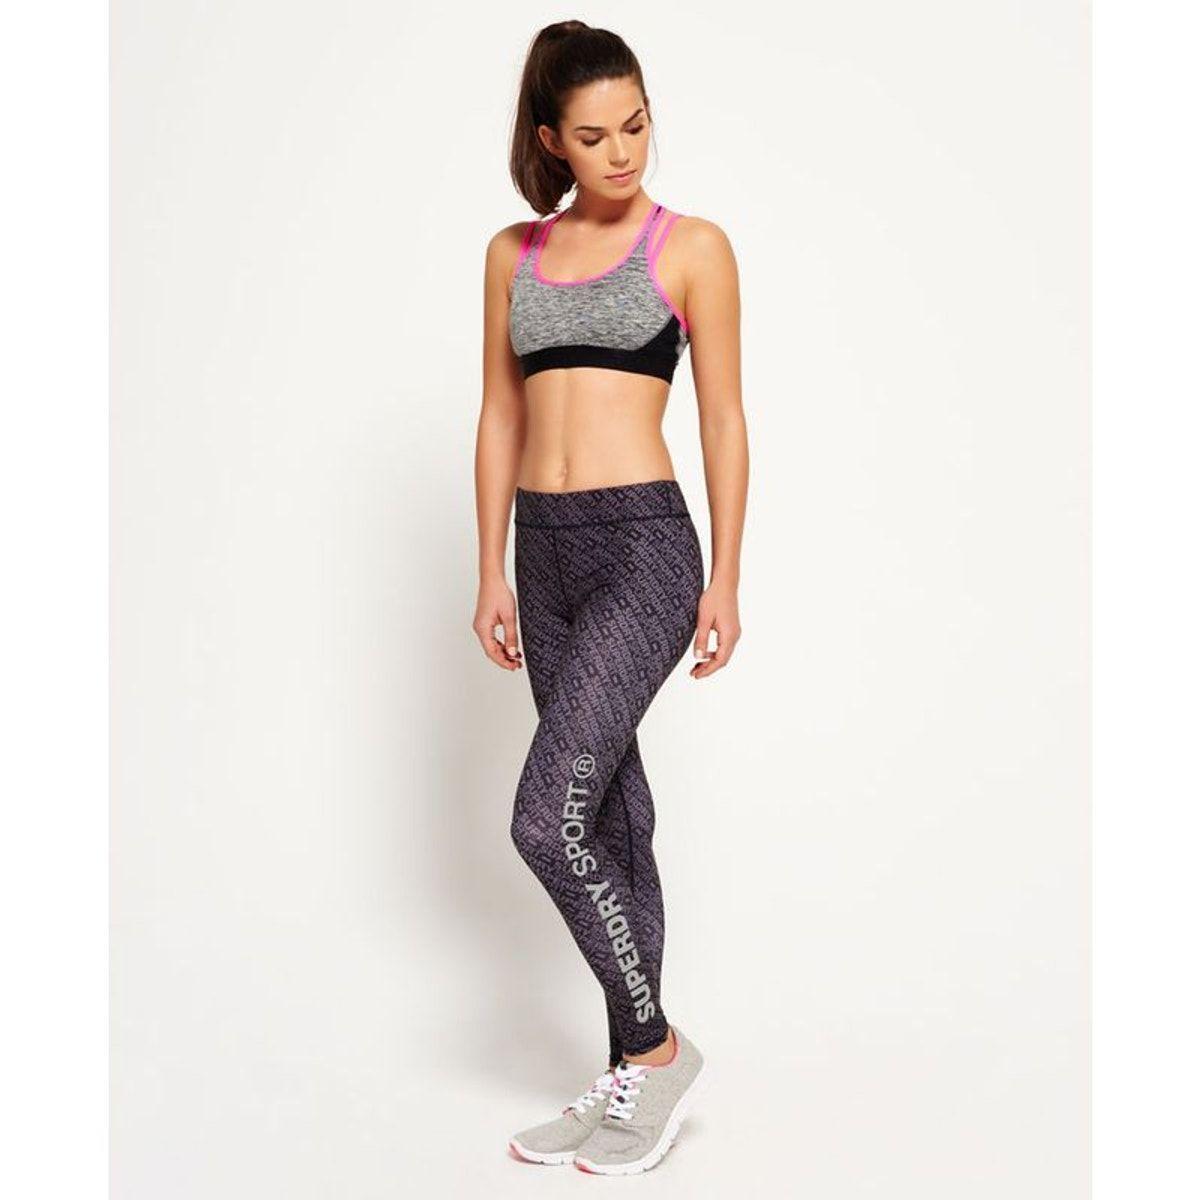 Legging Core Gym Taille : M;S;XS;XXS | Products | Leggings